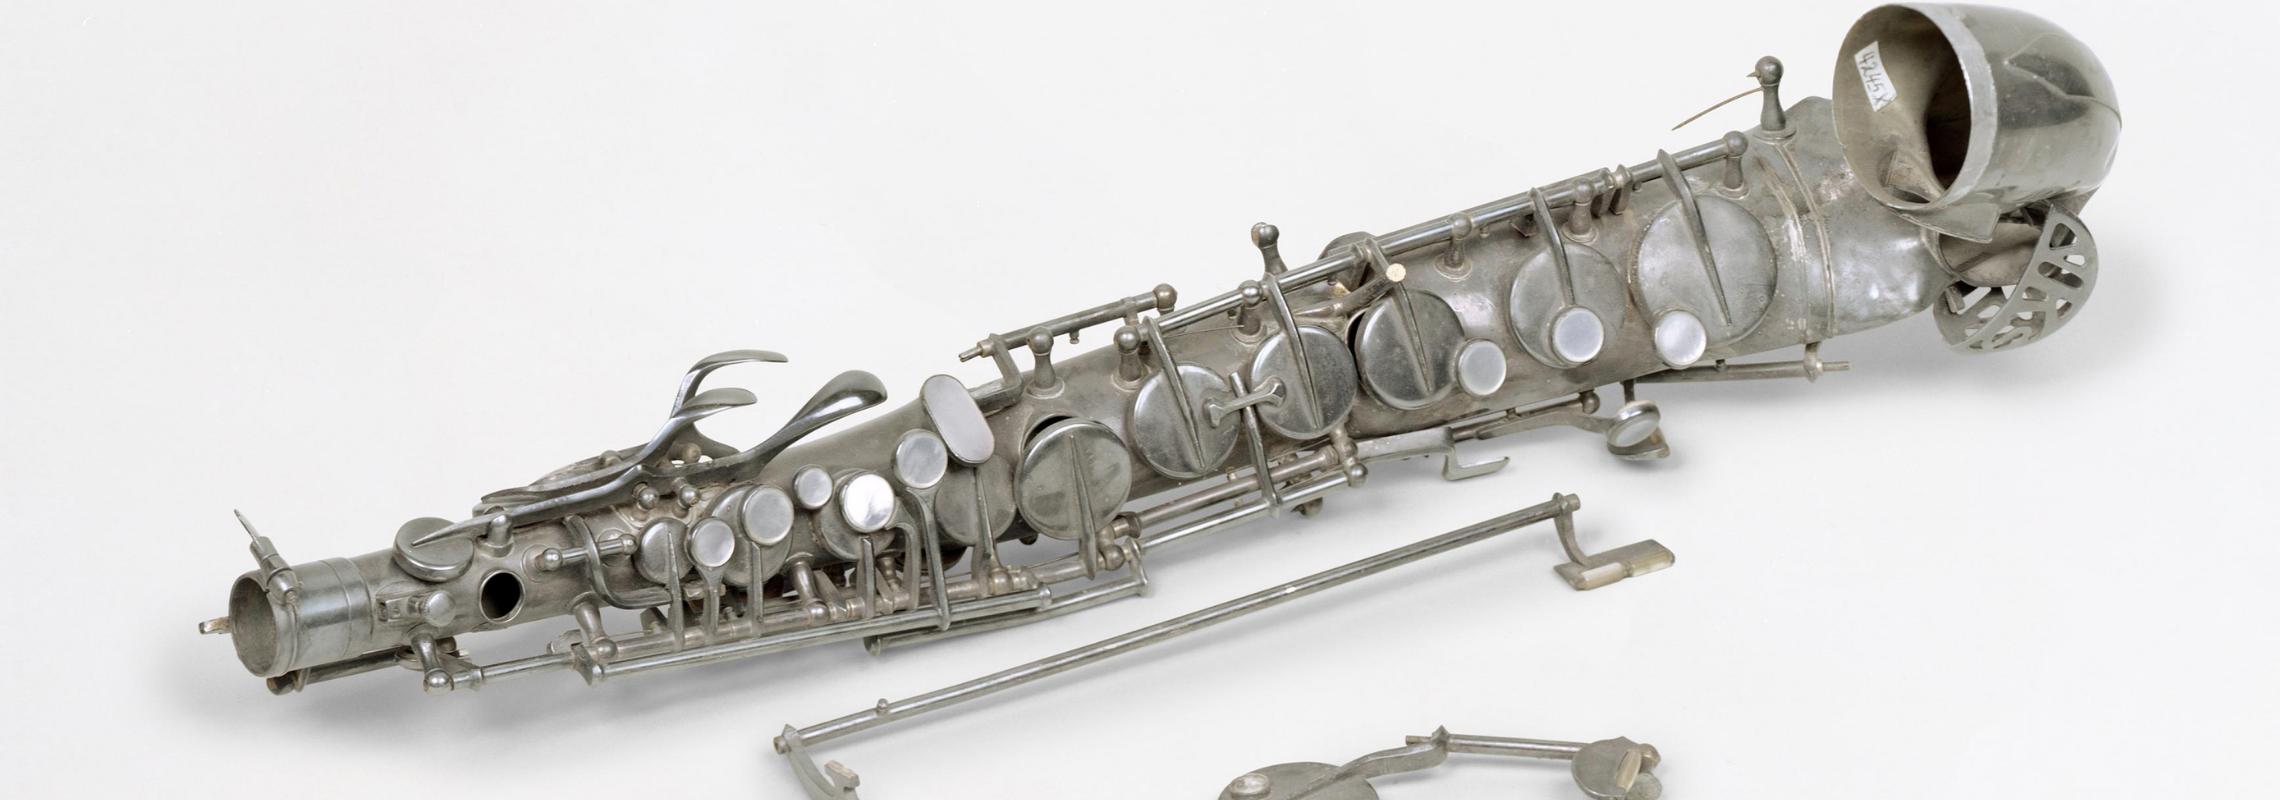 Susan Philipsz: War Damaged Musical Instruments